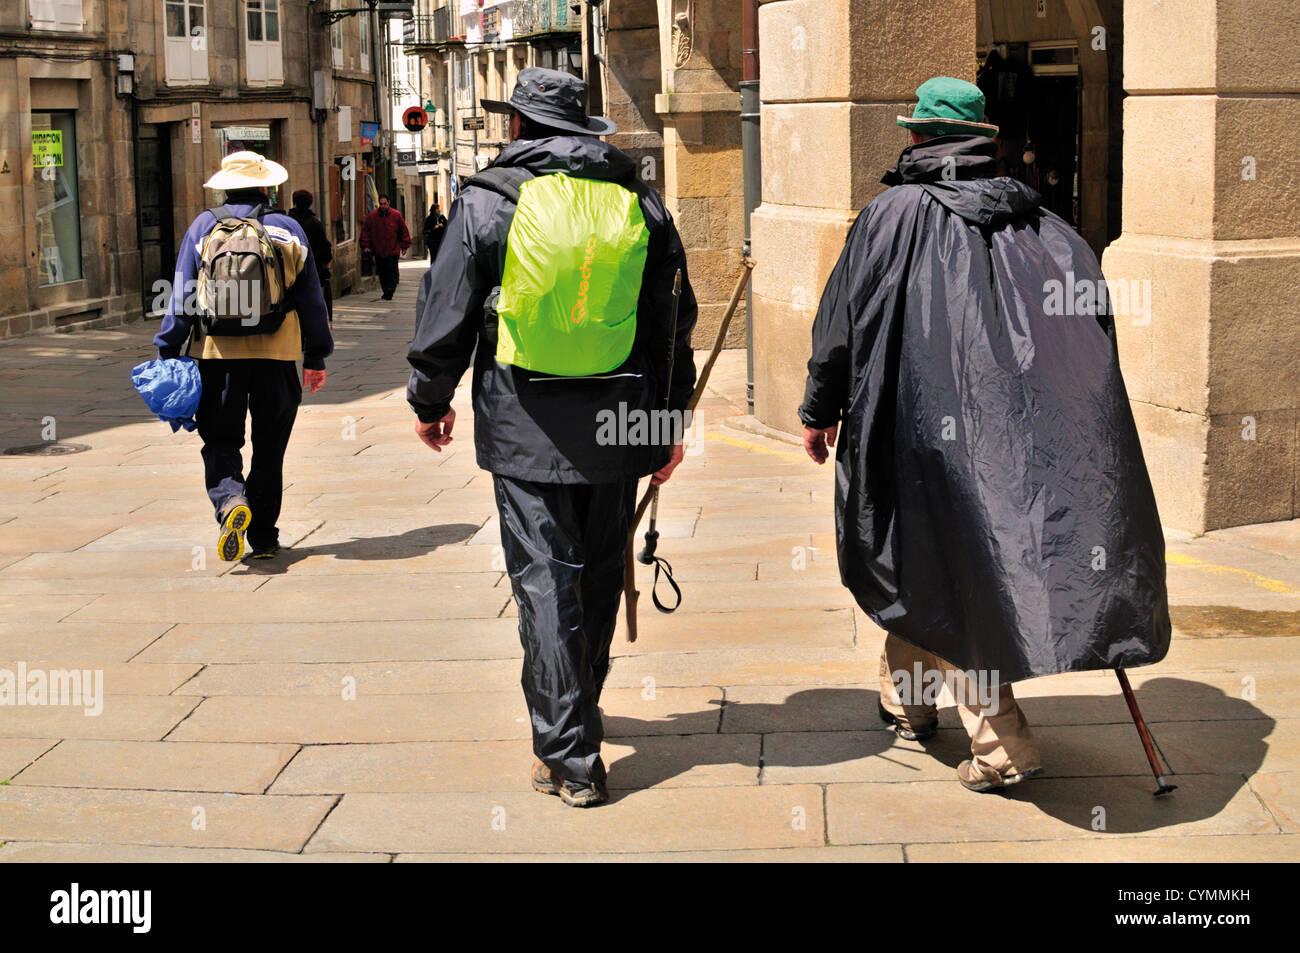 Spain, Galicia: St. James pilgrims arriving in Santiago de Compostela - Stock Image